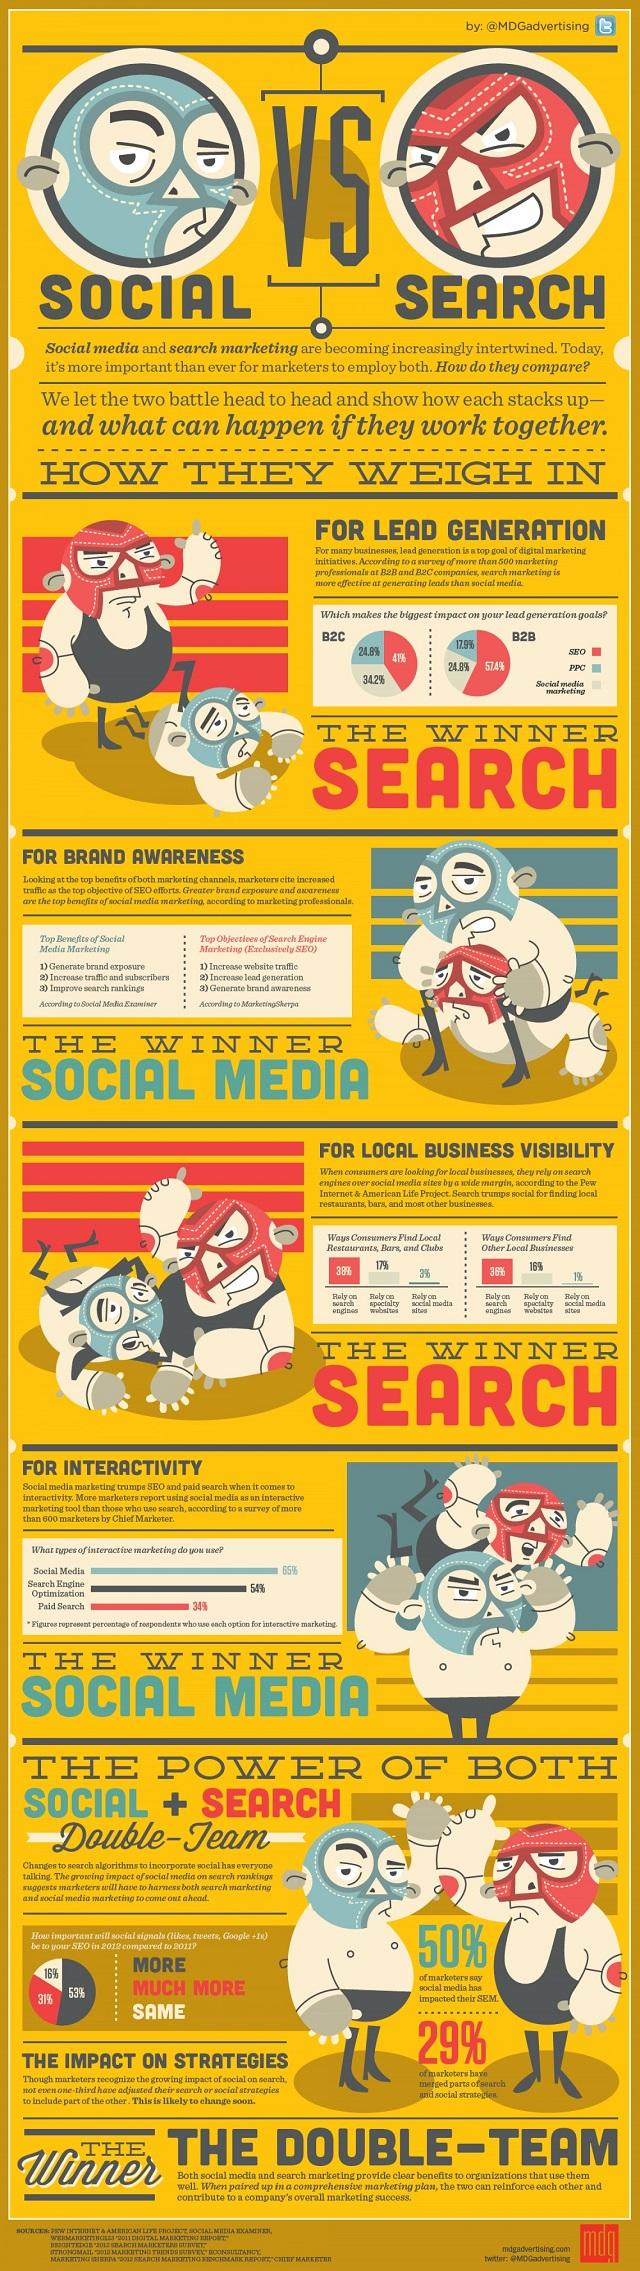 Suchmaschinenmarketing, Social Media-Marketing, Online Marketing Strategie